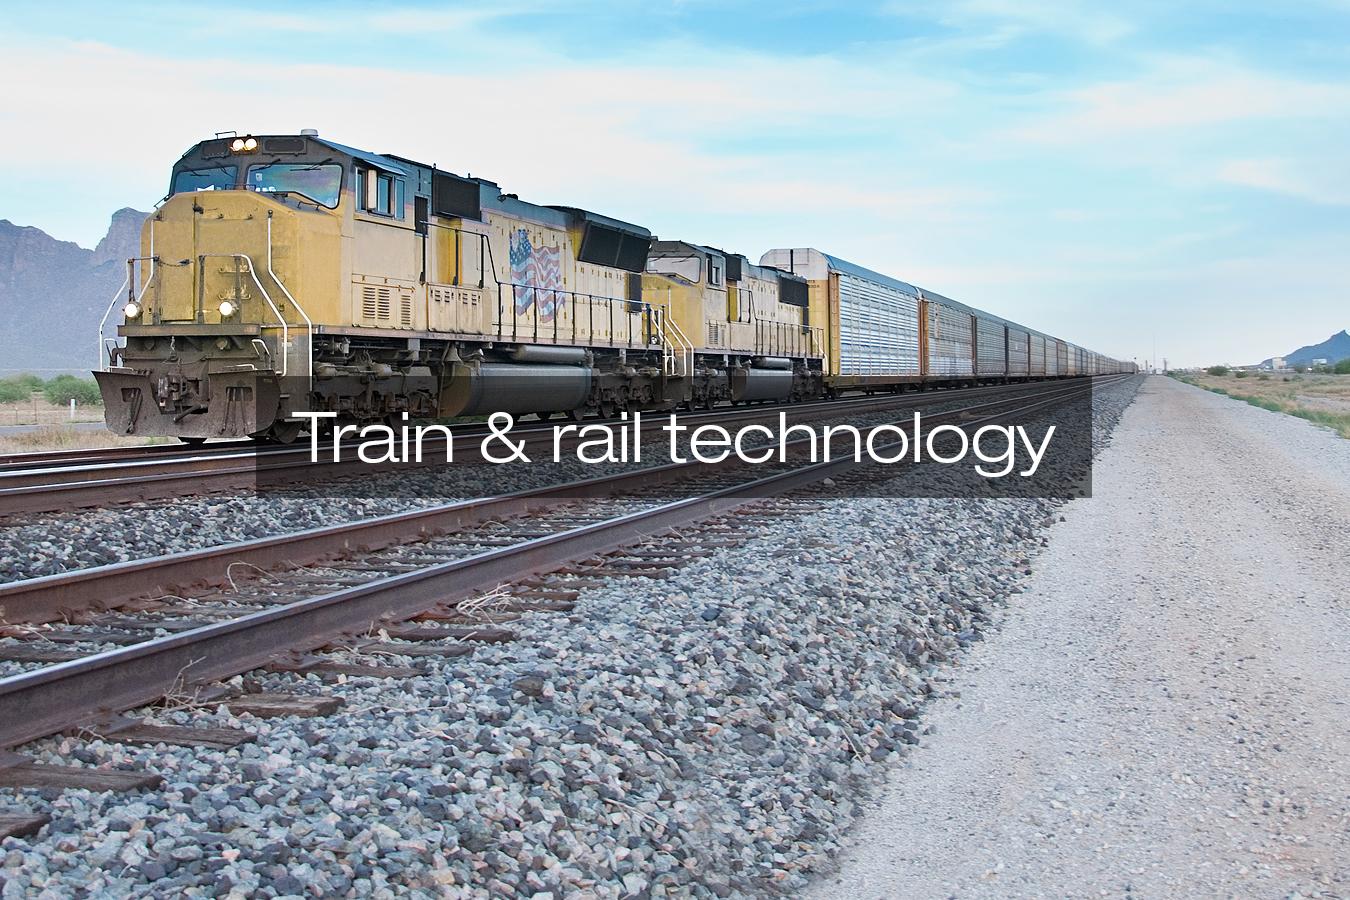 Zahnradfertigung OTT | Branche Zug- und Bahntechnik